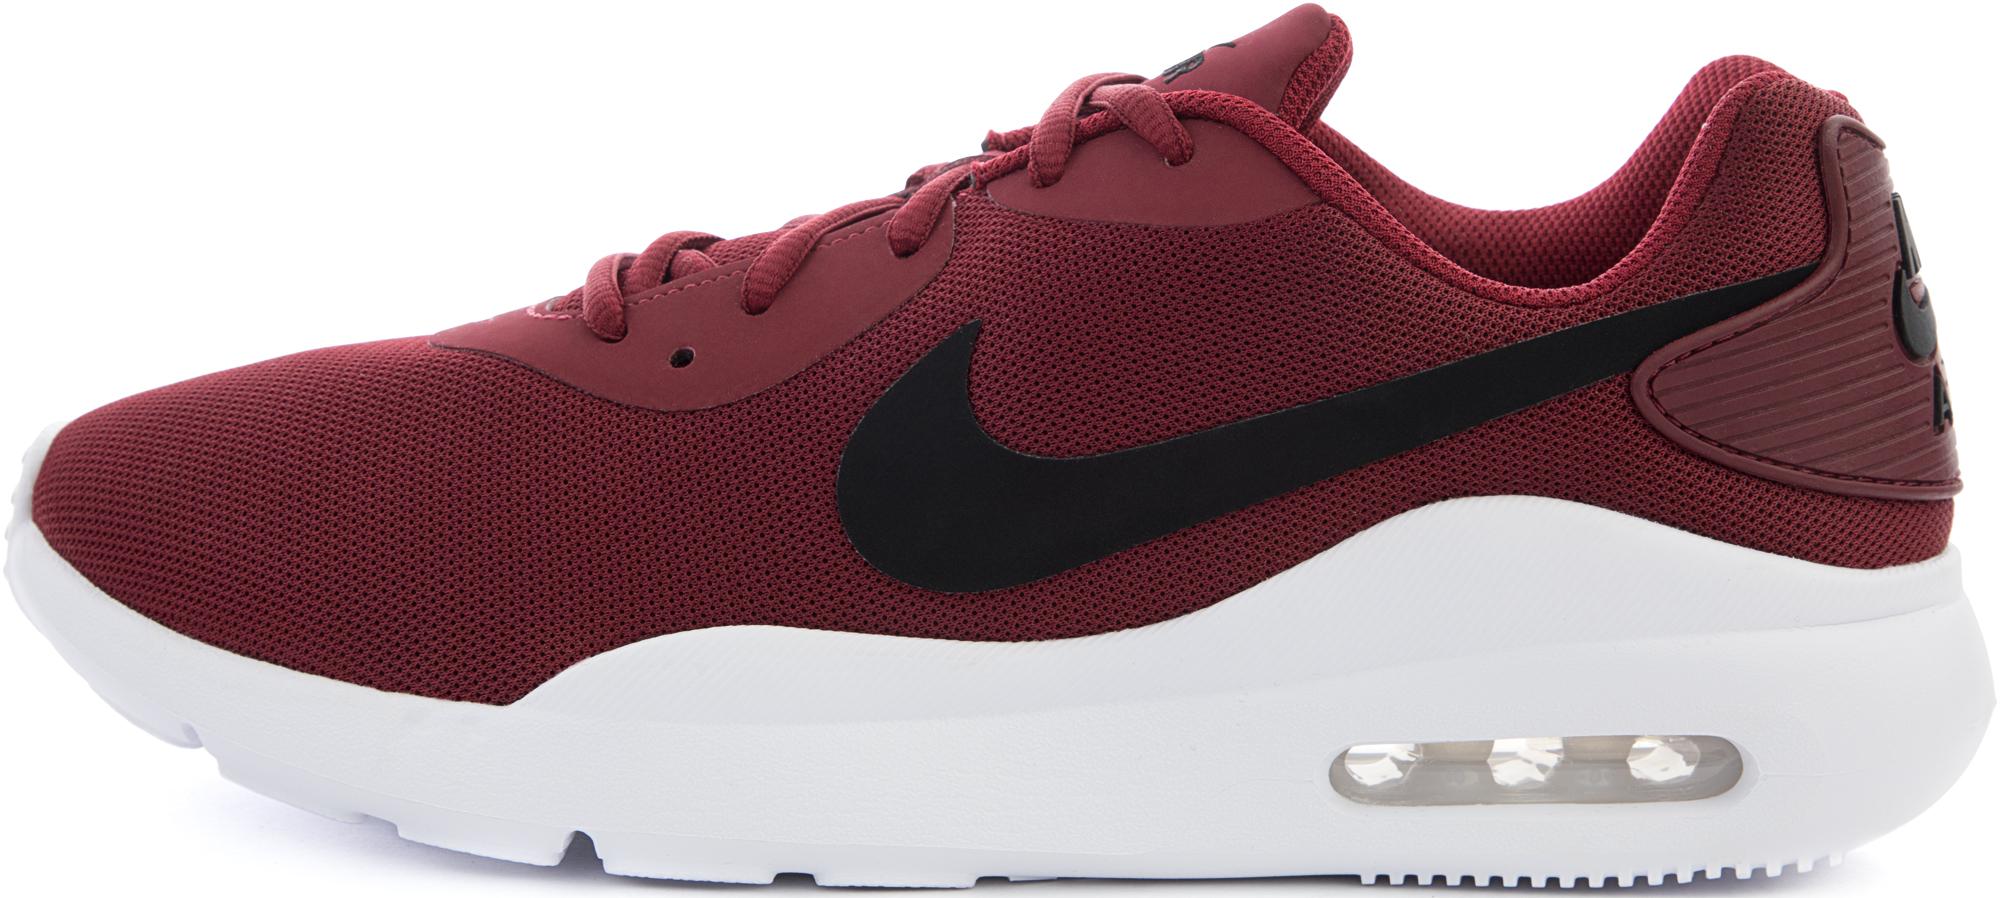 Nike Кроссовки мужские Nike Air Max Raito, размер 40 цена